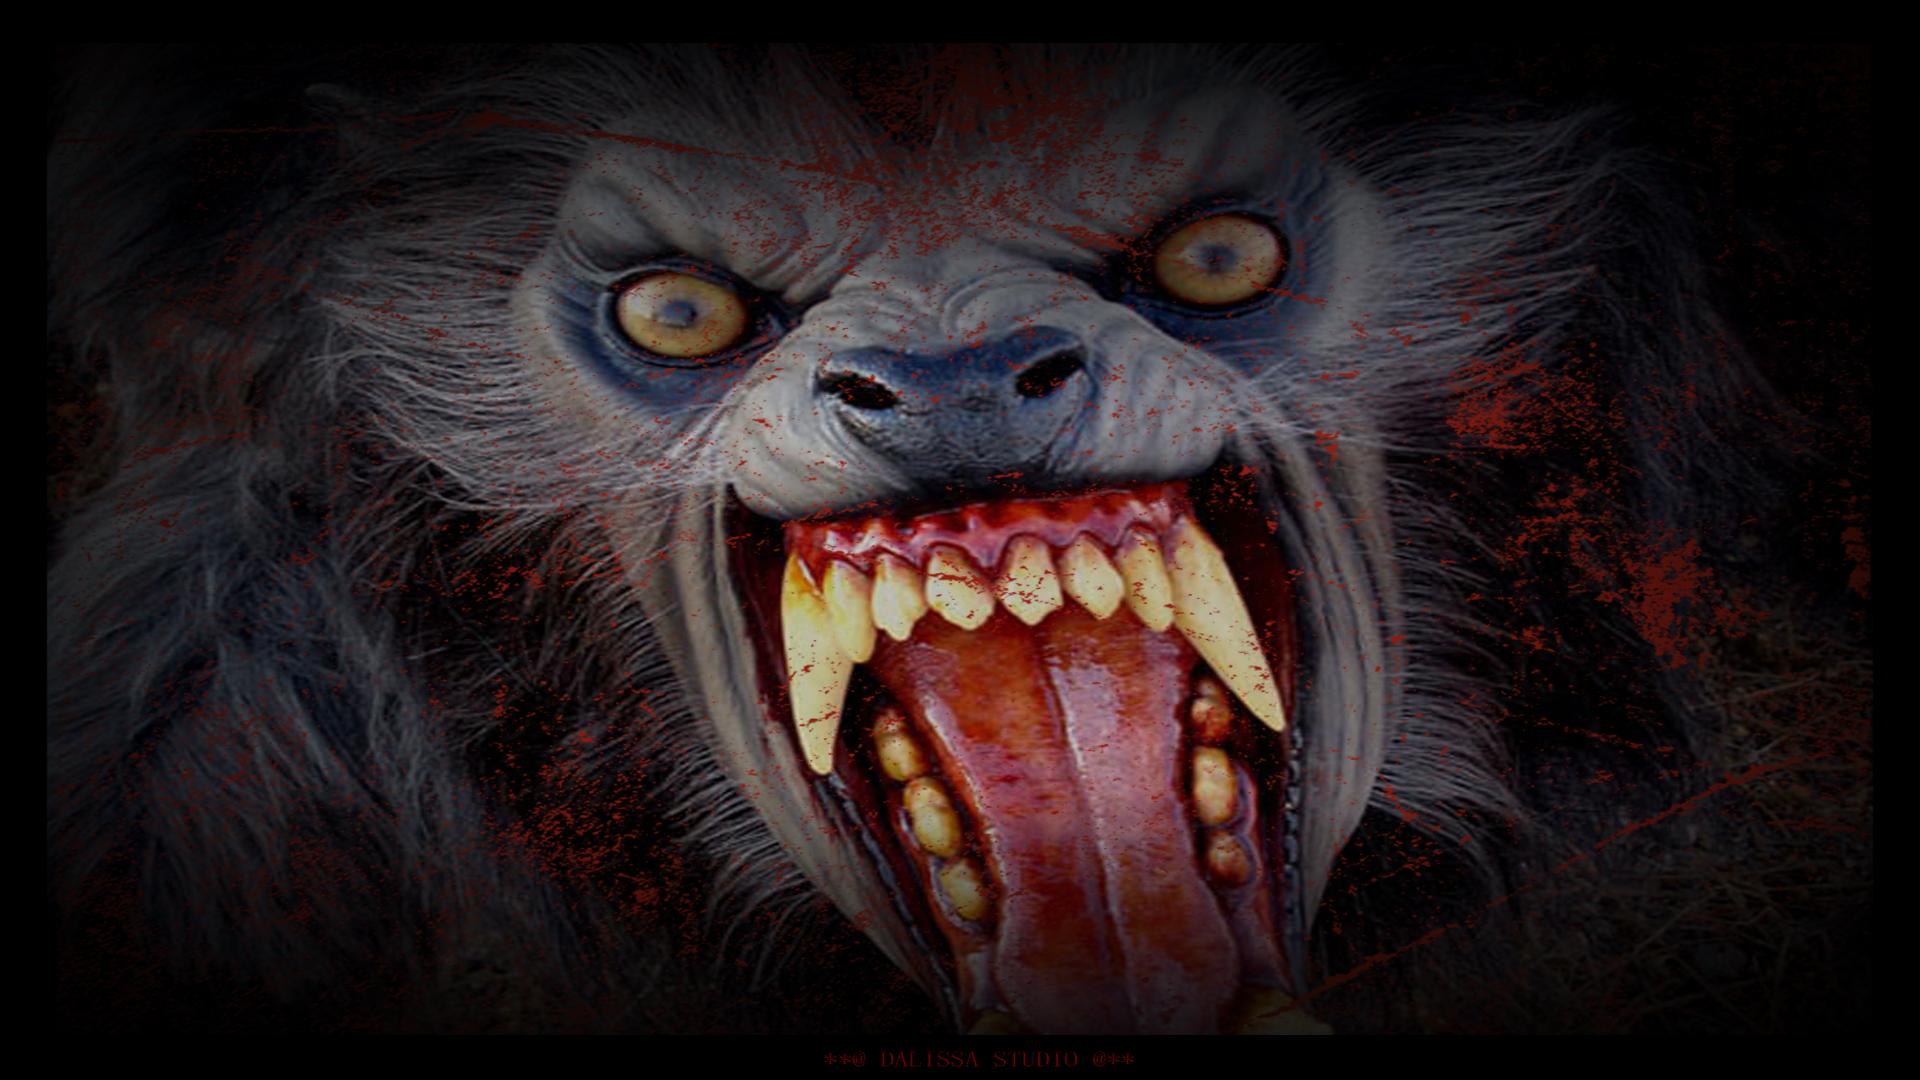 Werewolf Computer Wallpapers Desktop Backgrounds 1920x1080 ID 1920x1080